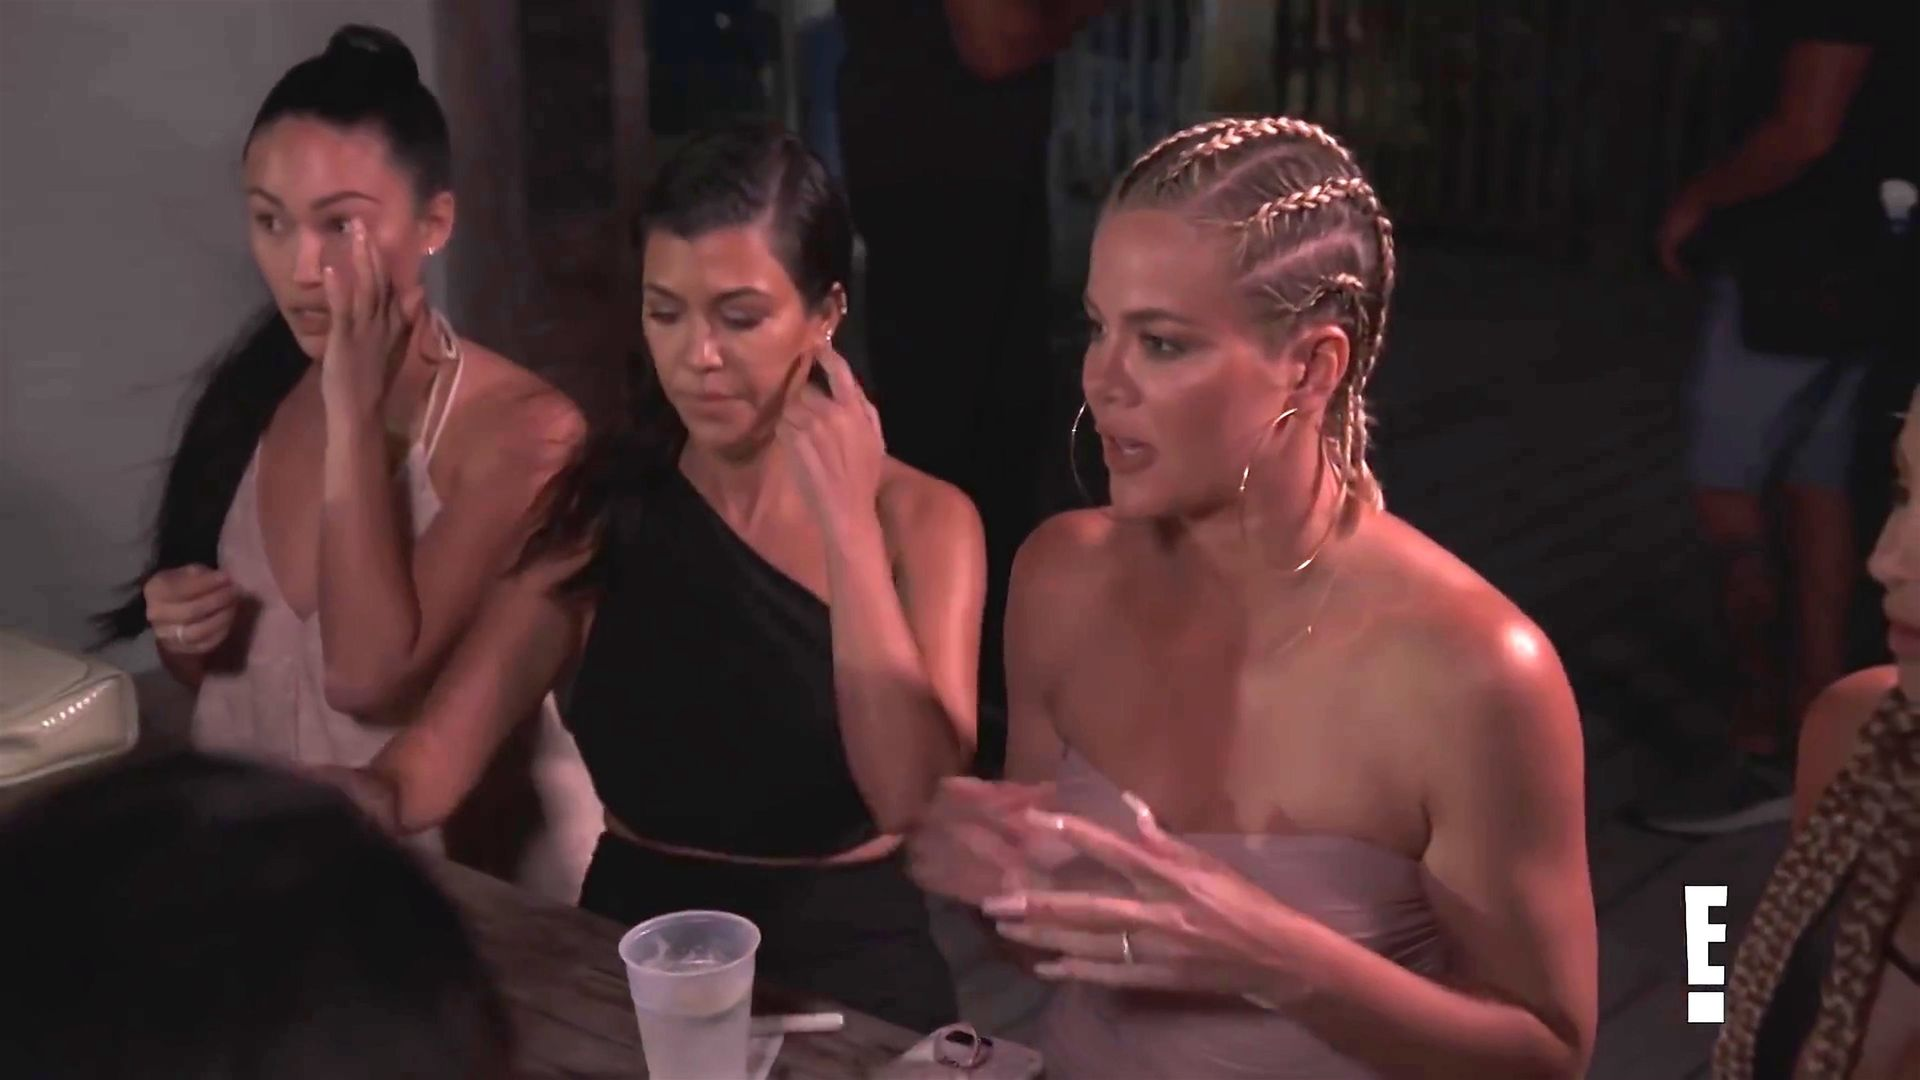 Khloé Kardashian Gets A Little Cold Without A Bra 0024